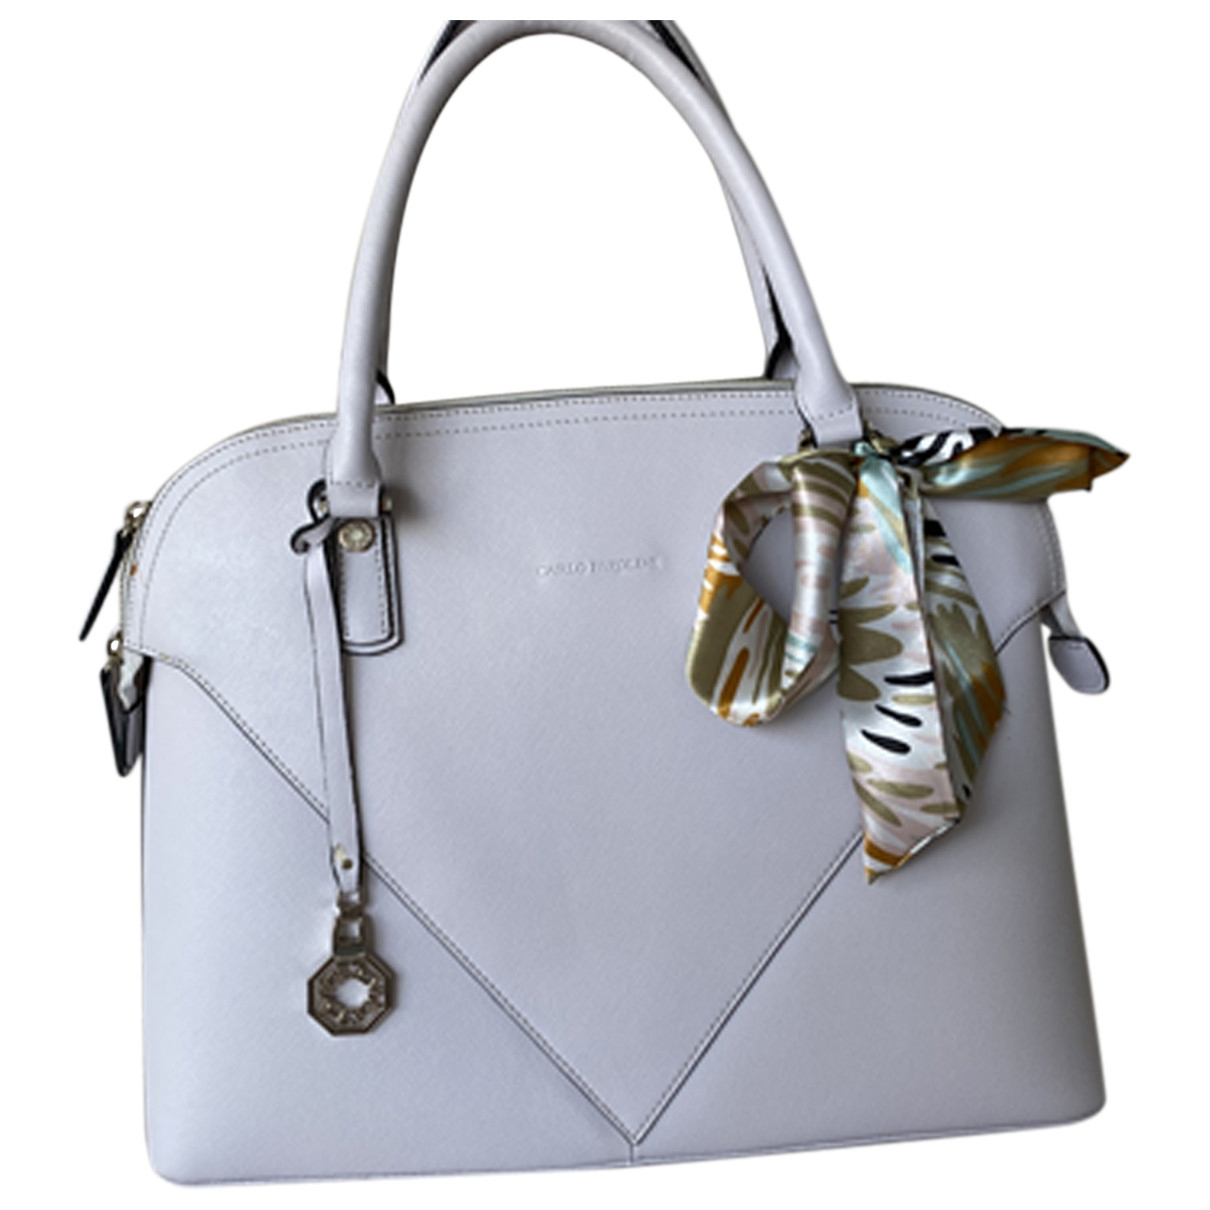 Carlo Pazolini \N Leather handbag for Women \N